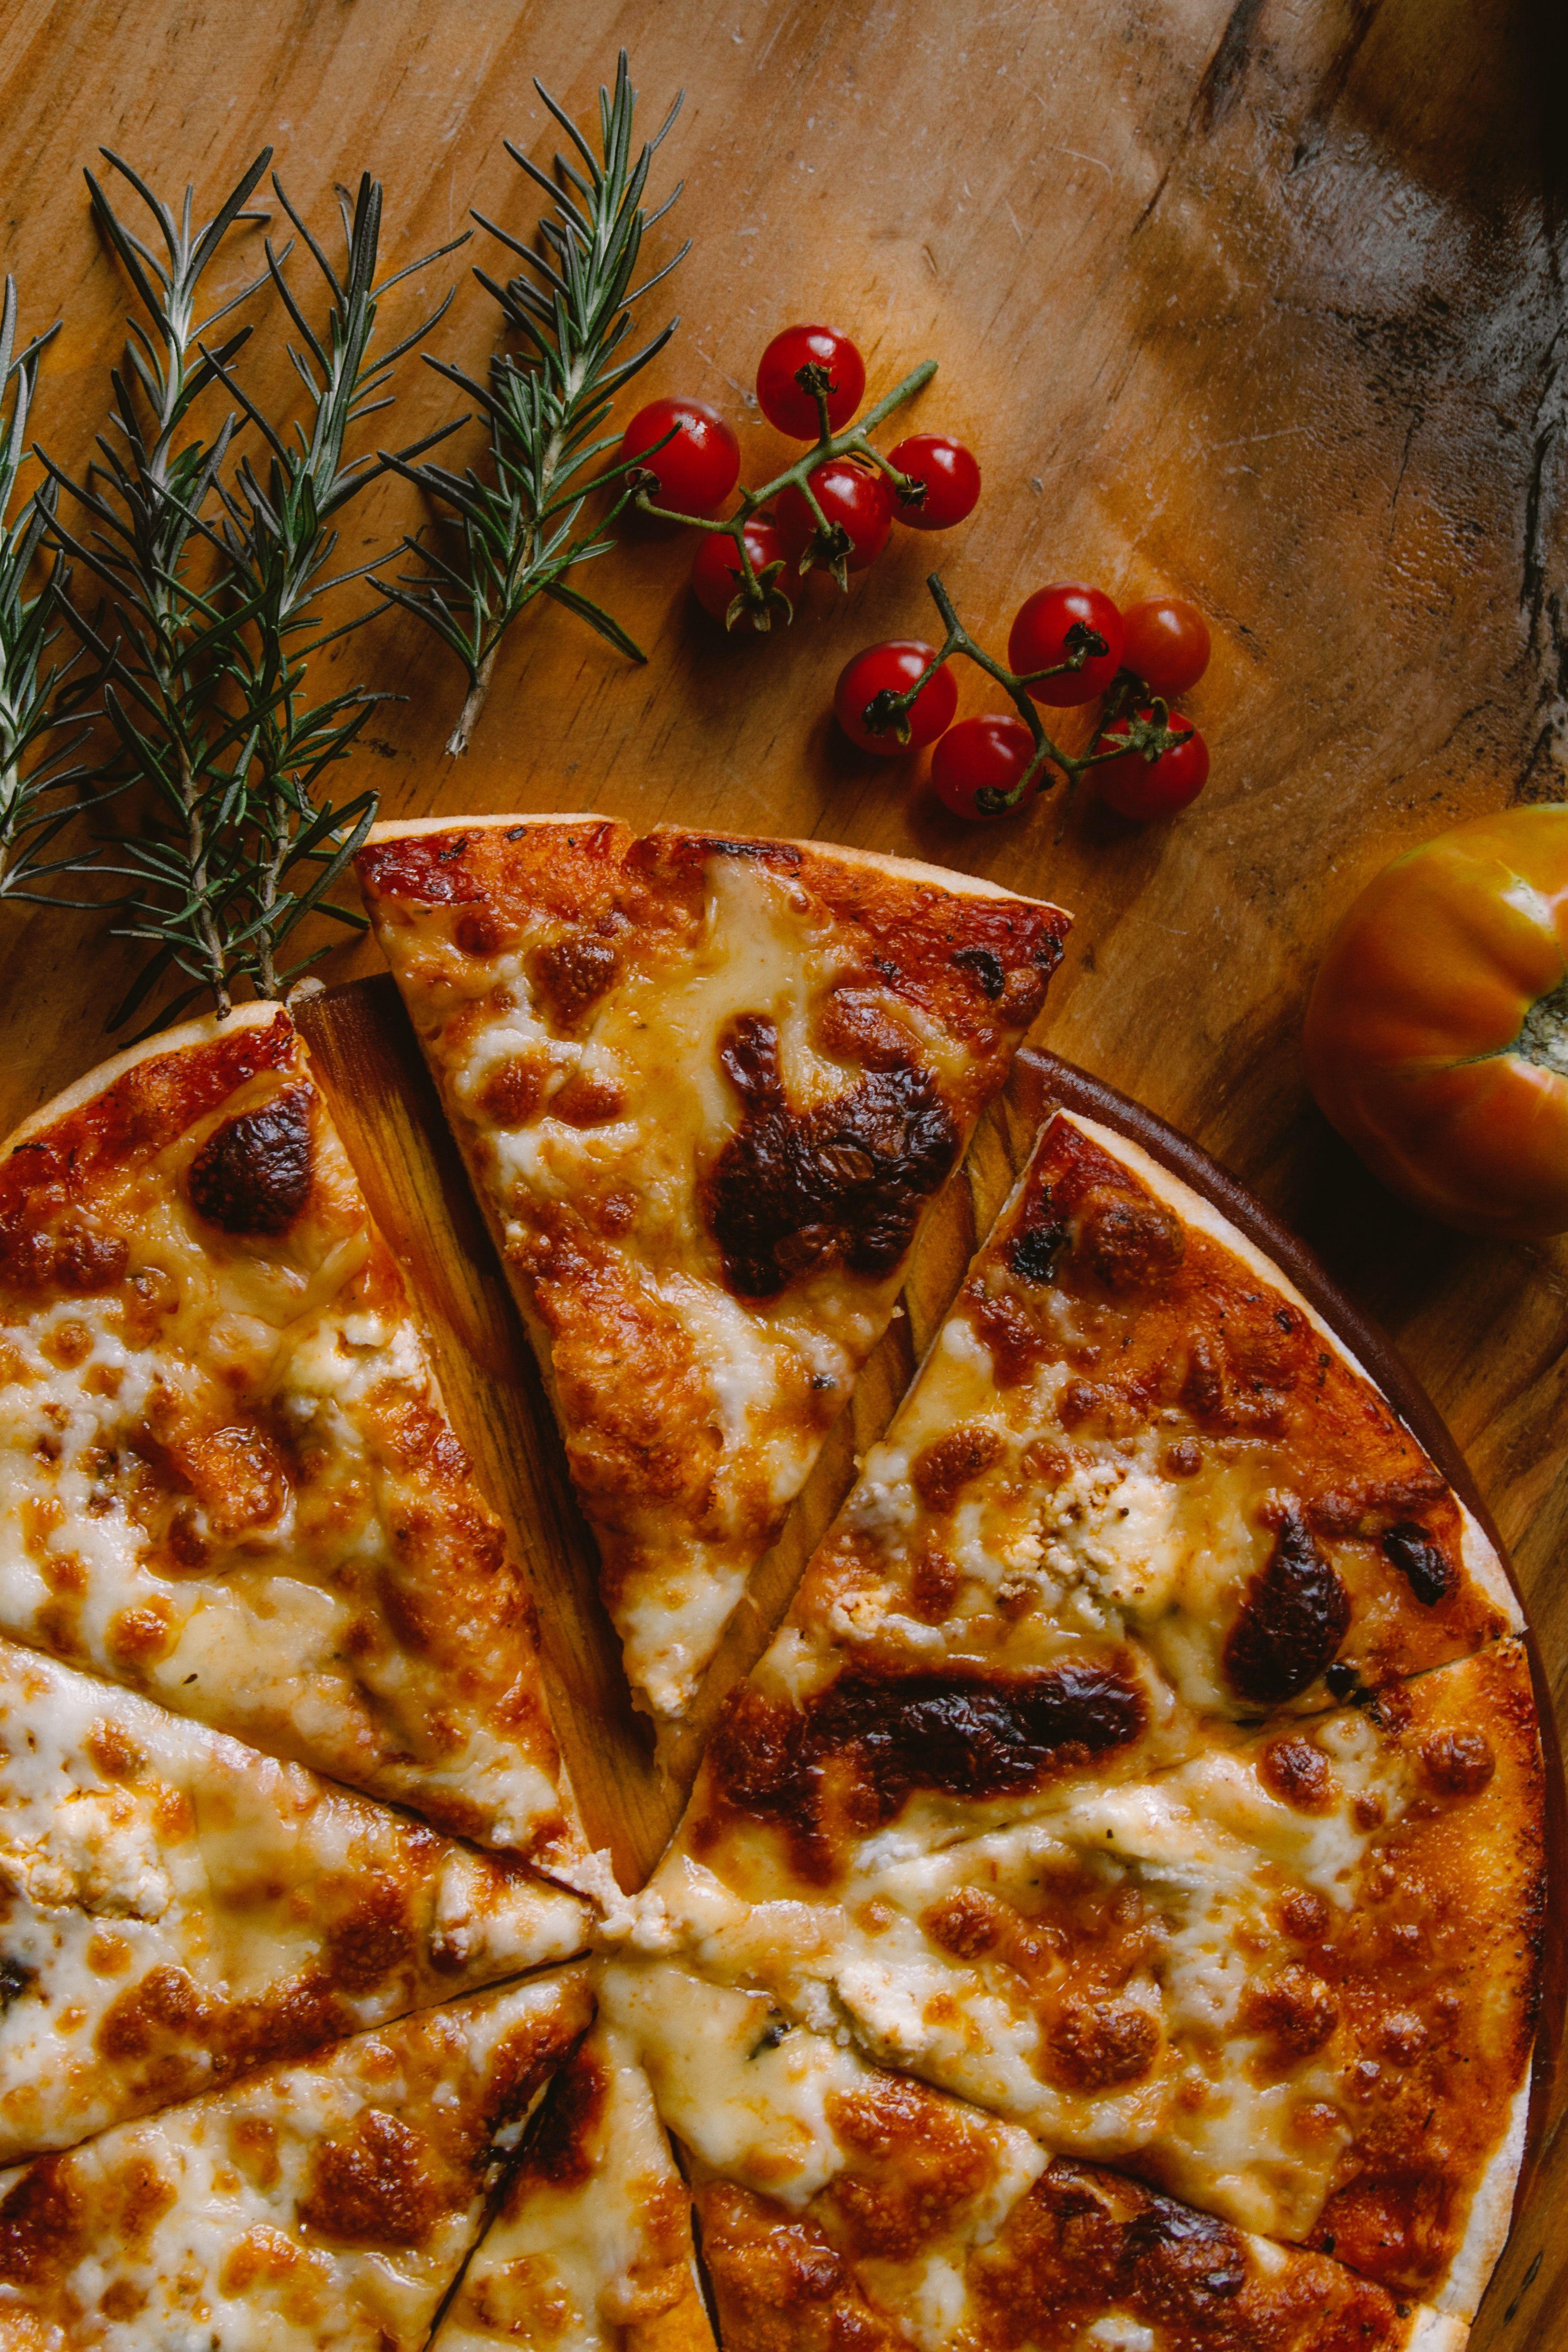 Pizza_ivan-torres-mquqbmszggm-unsplash